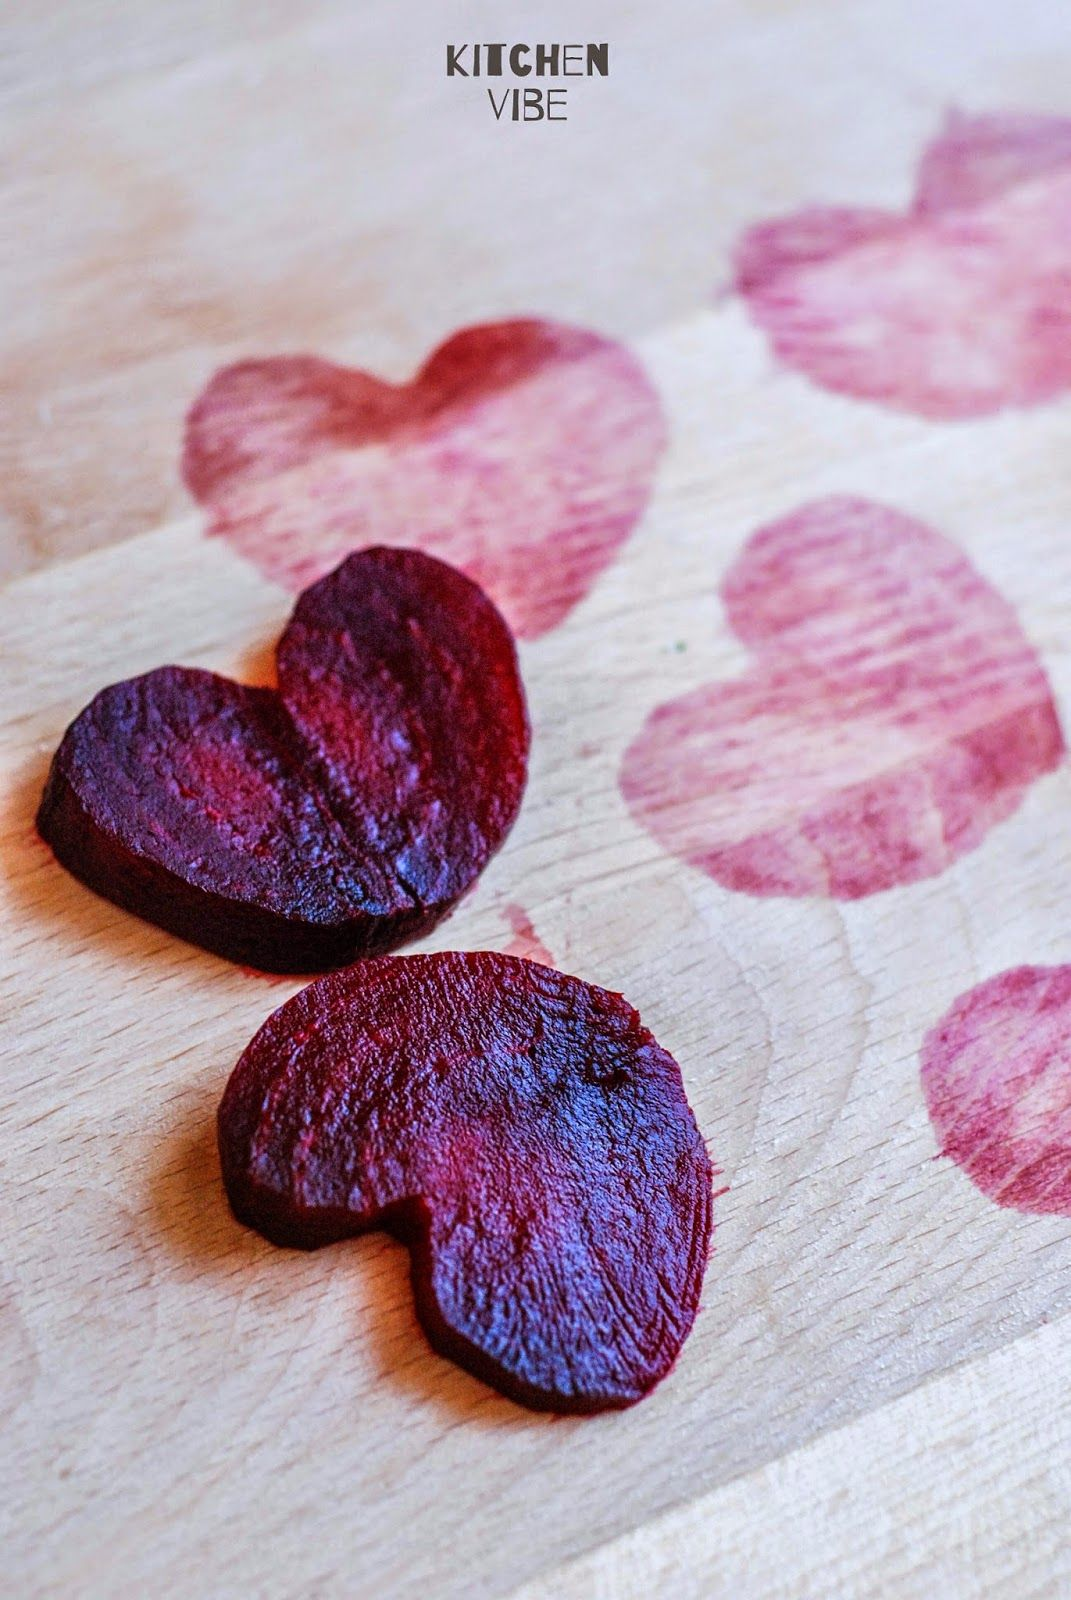 beetroot hearts